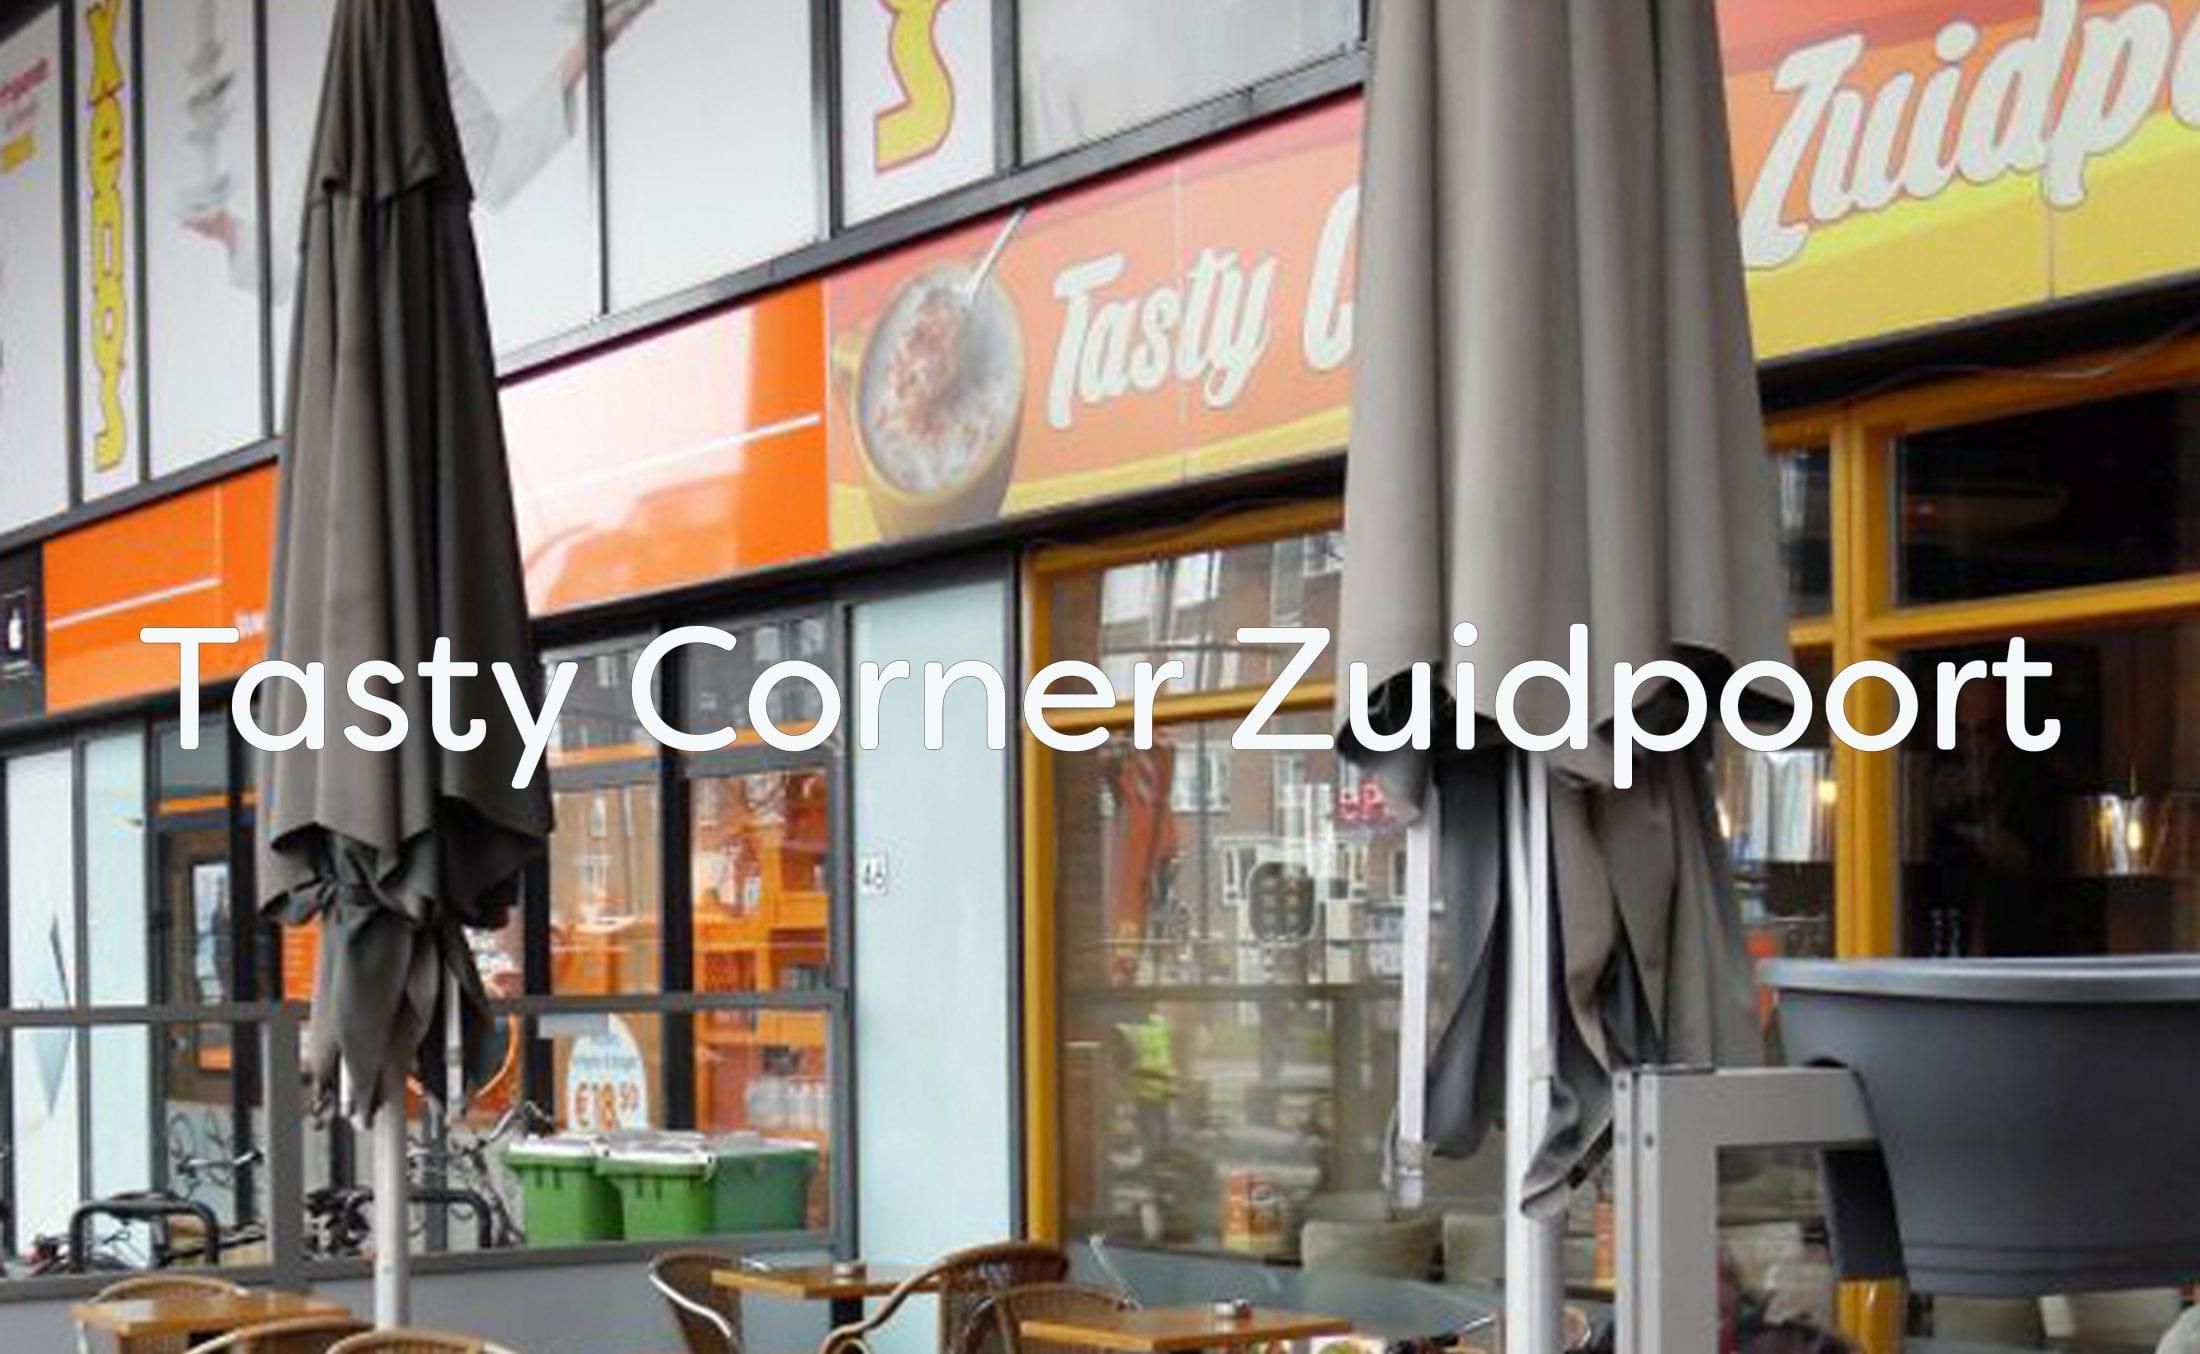 Tasty Corner Zuidpoort